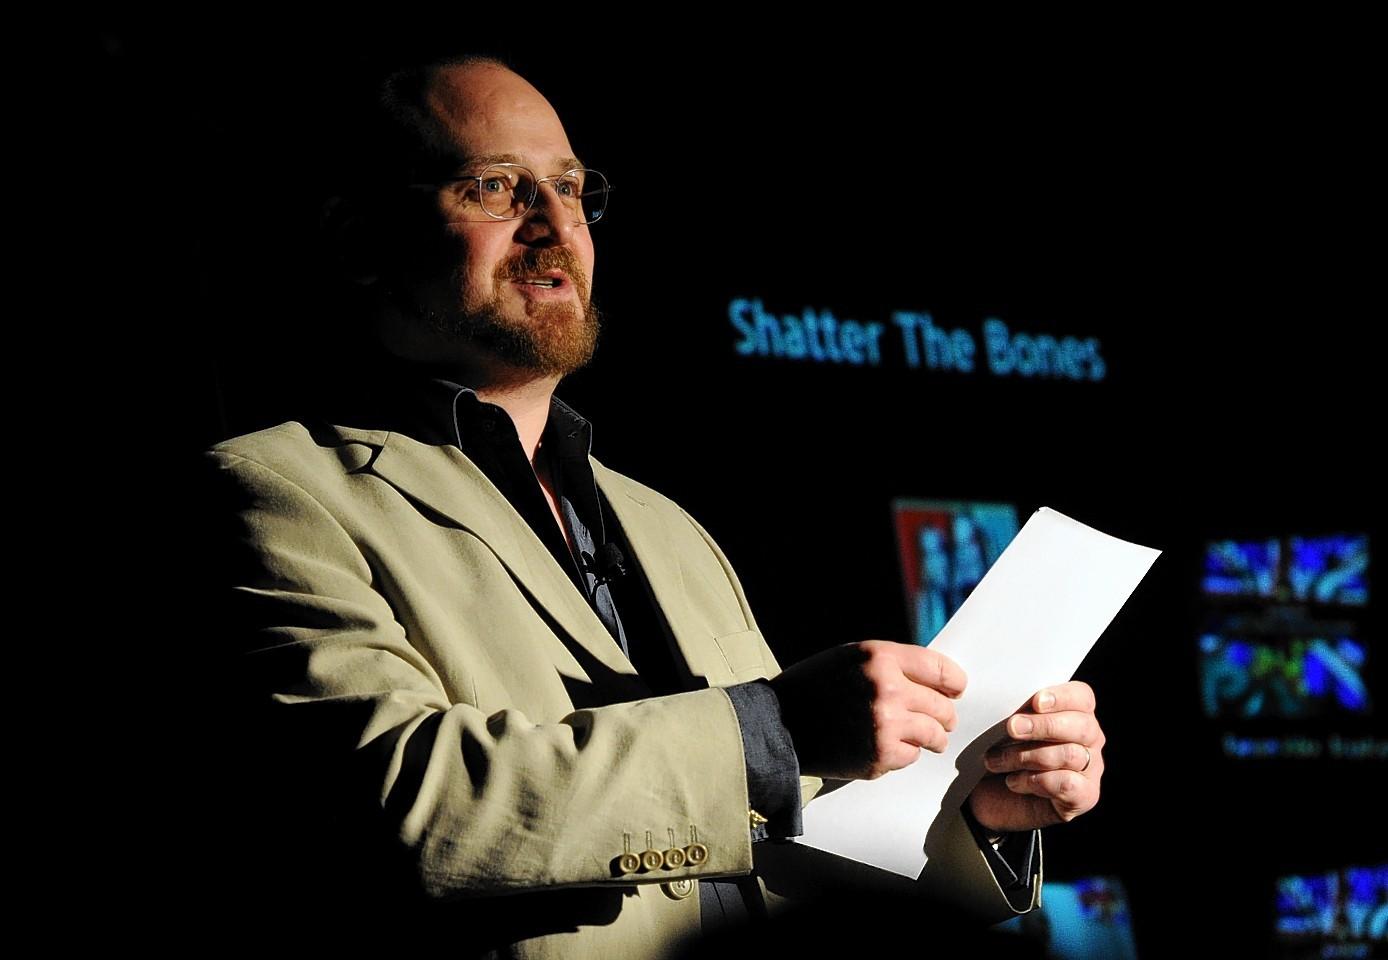 Scottish crime-writer Stuart MacBride